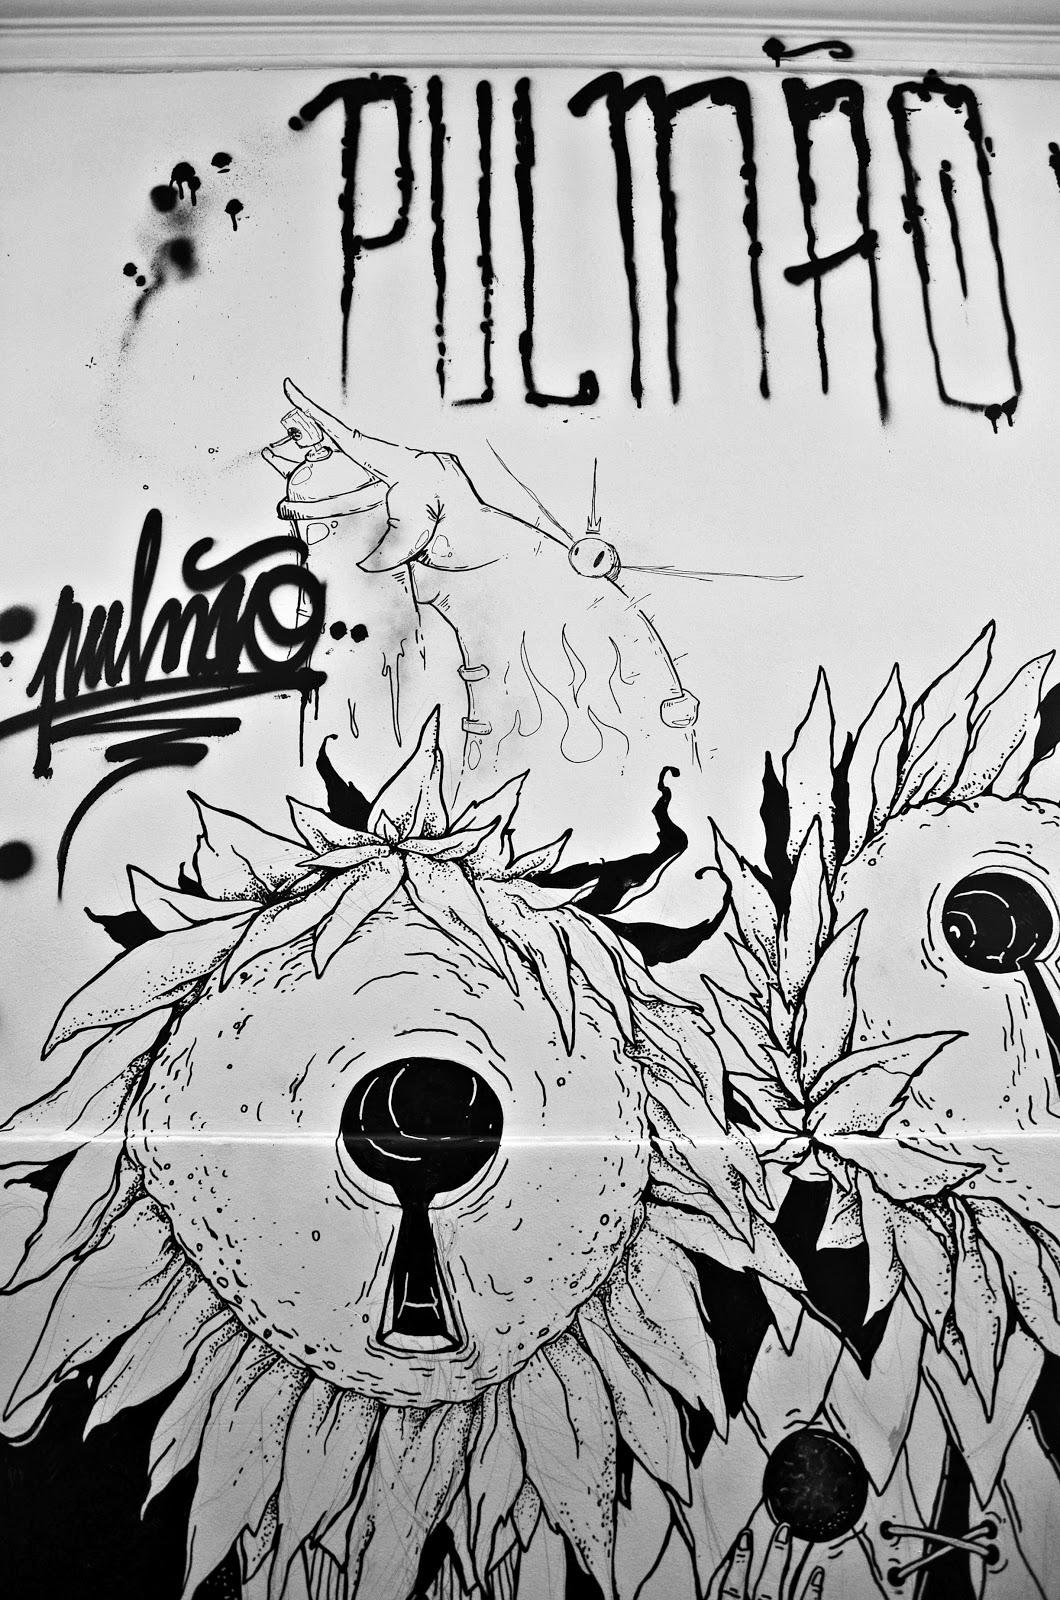 PULMAO 95 Art  by Felipe Pilotto Photography 051